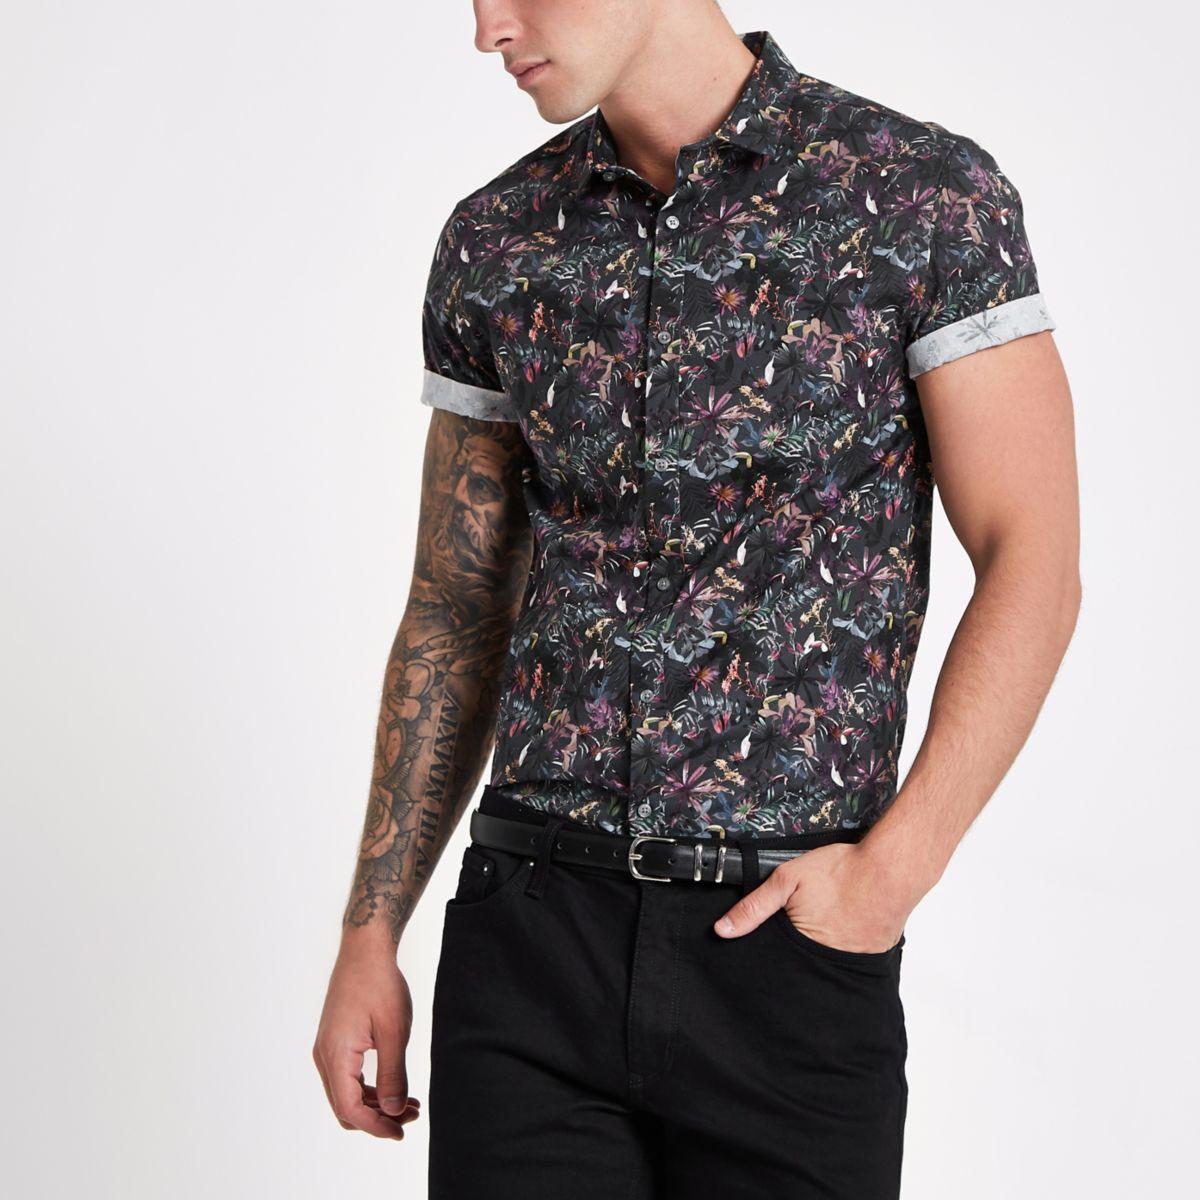 Black muscle fit floral shirt